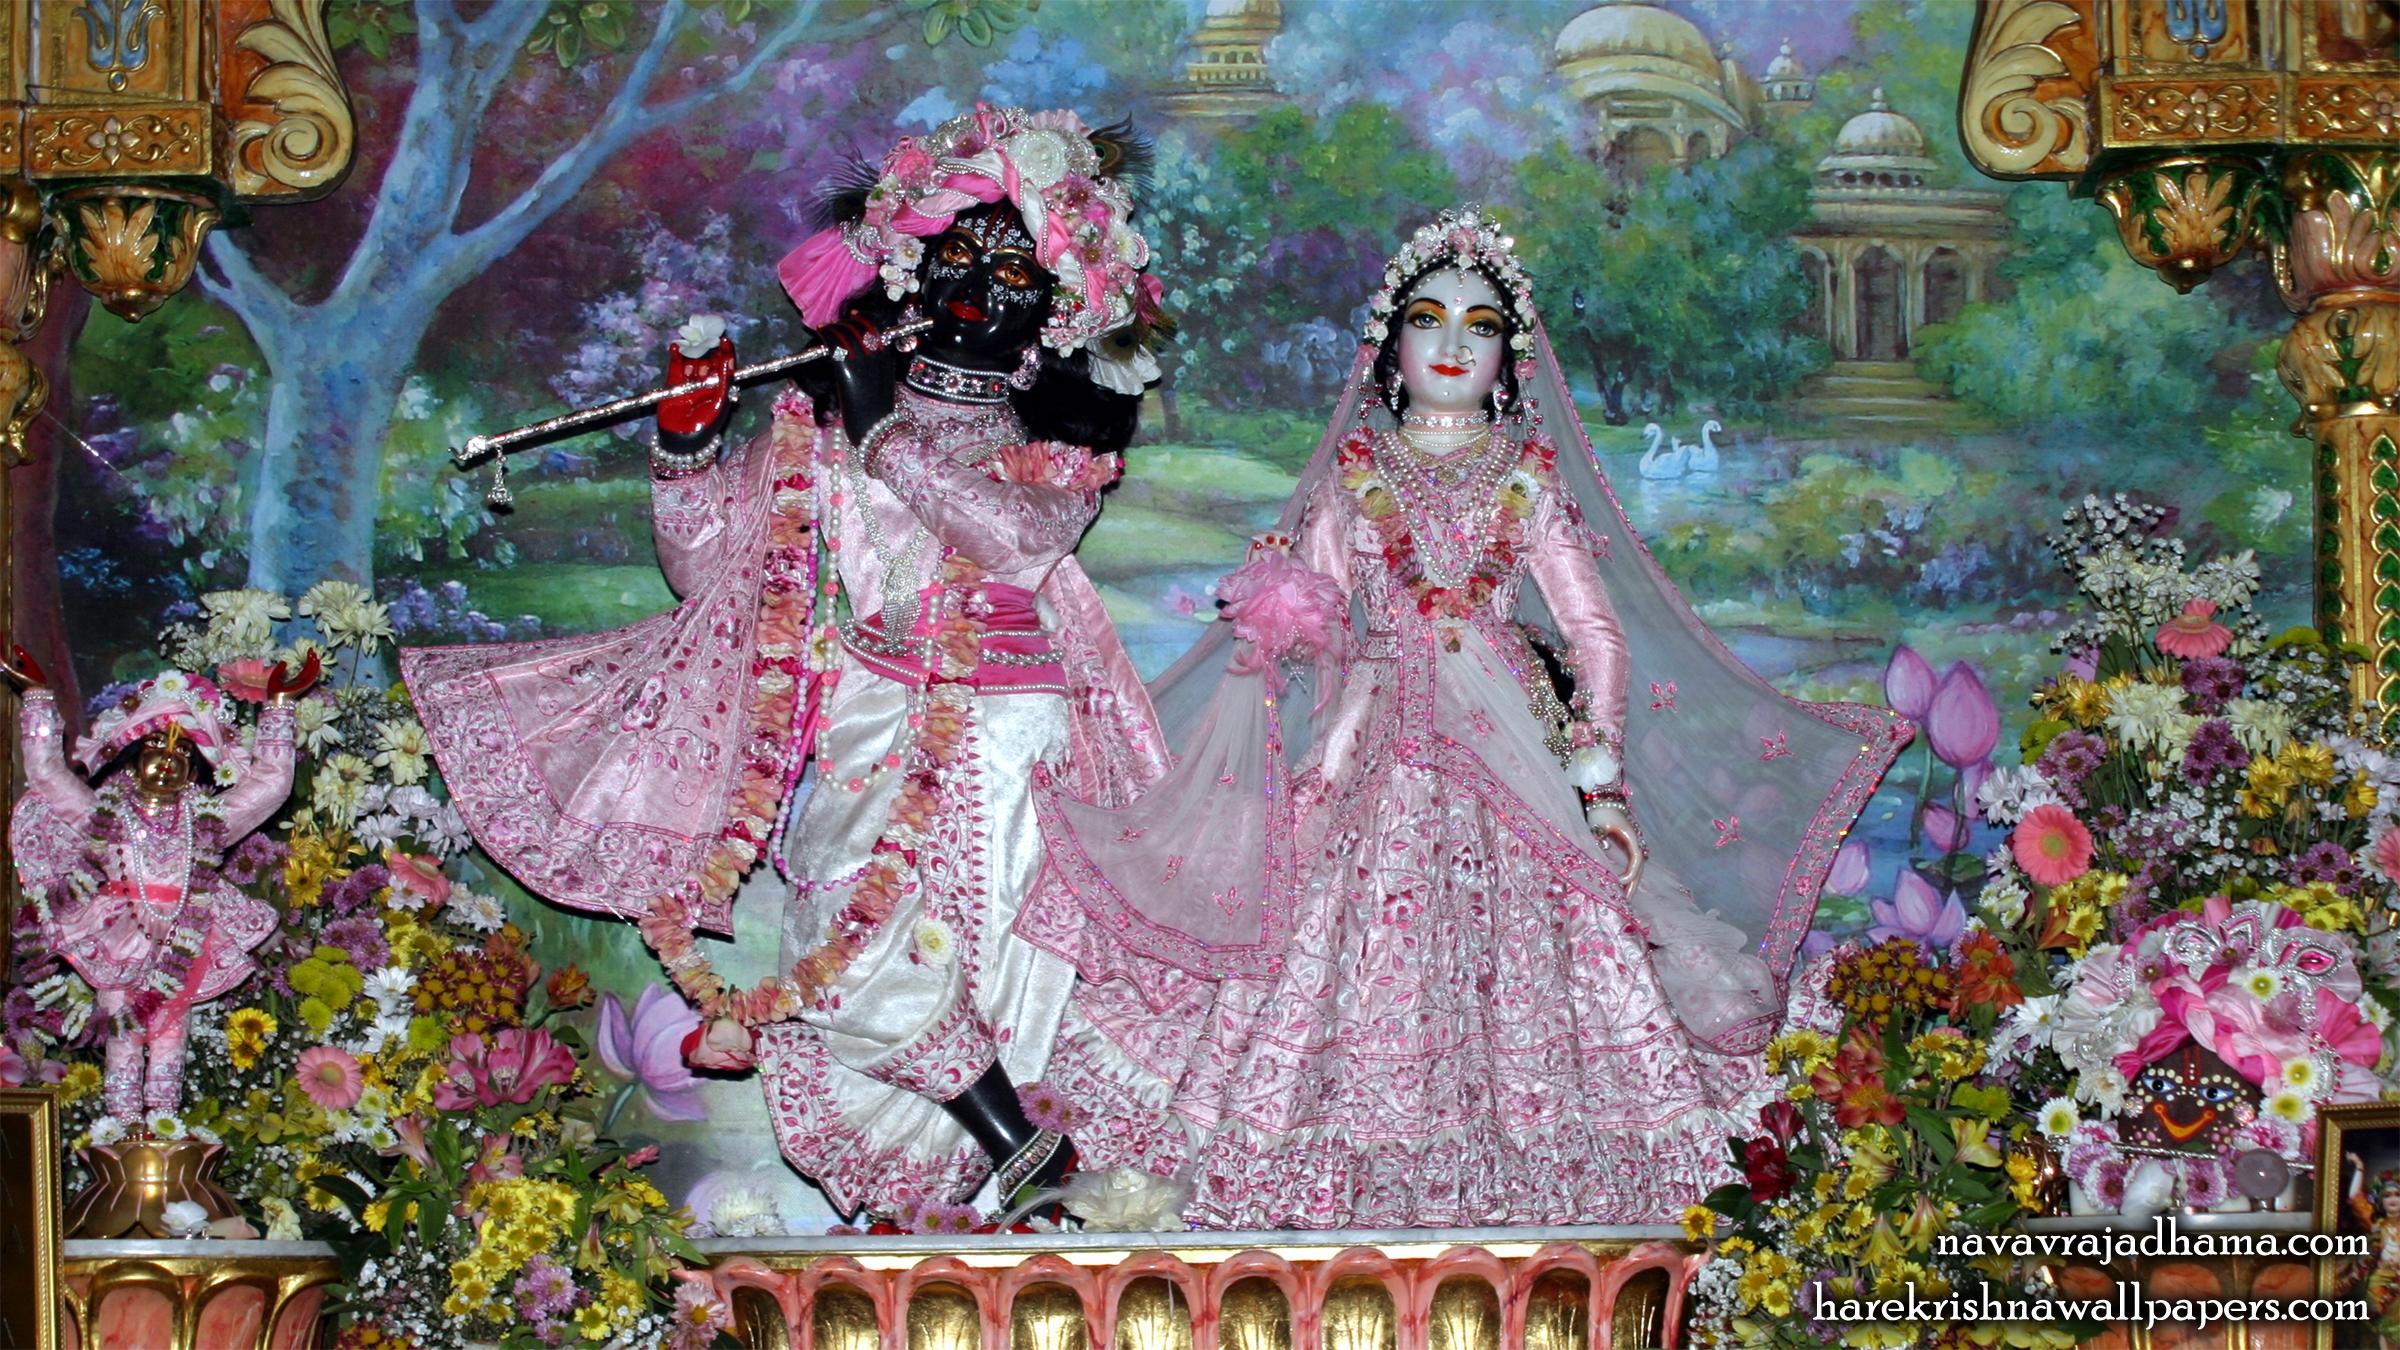 Sri Sri Radha Shyamsundar Wallpaper (011) Size 2400x1350 Download